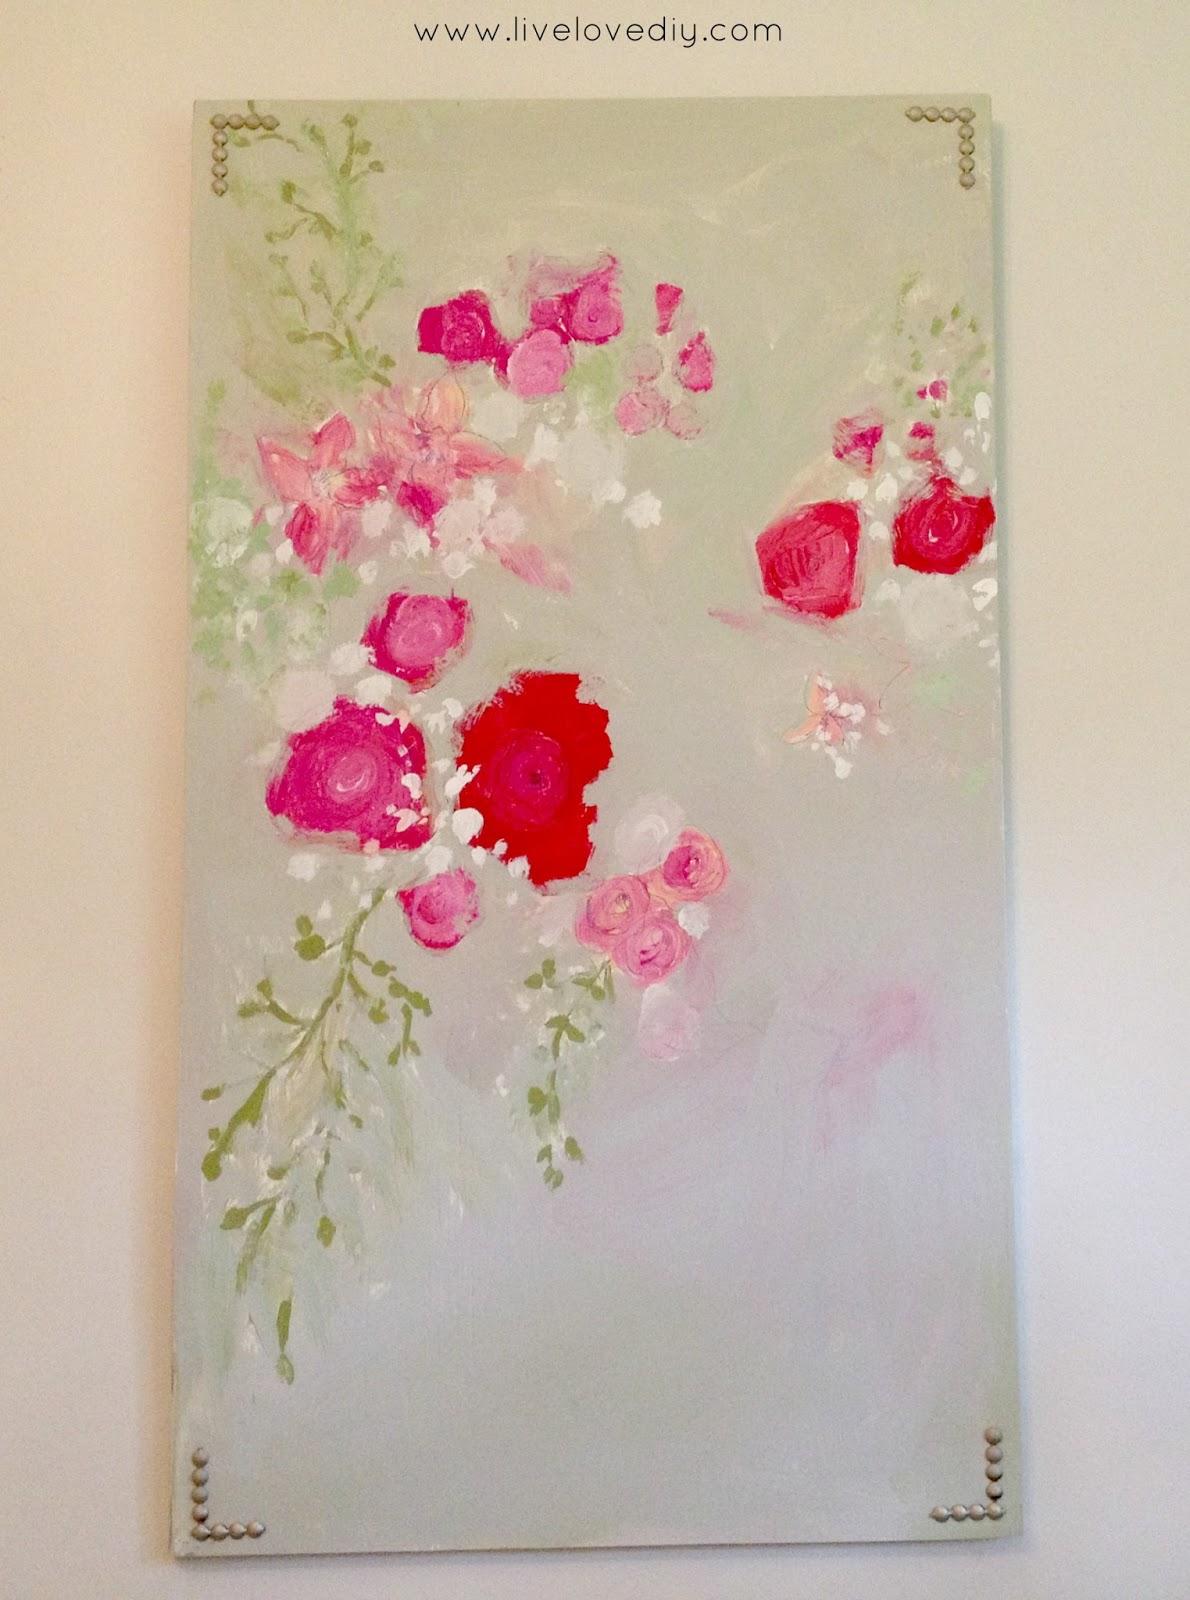 Livelovediy How To Make Easy Floral Art